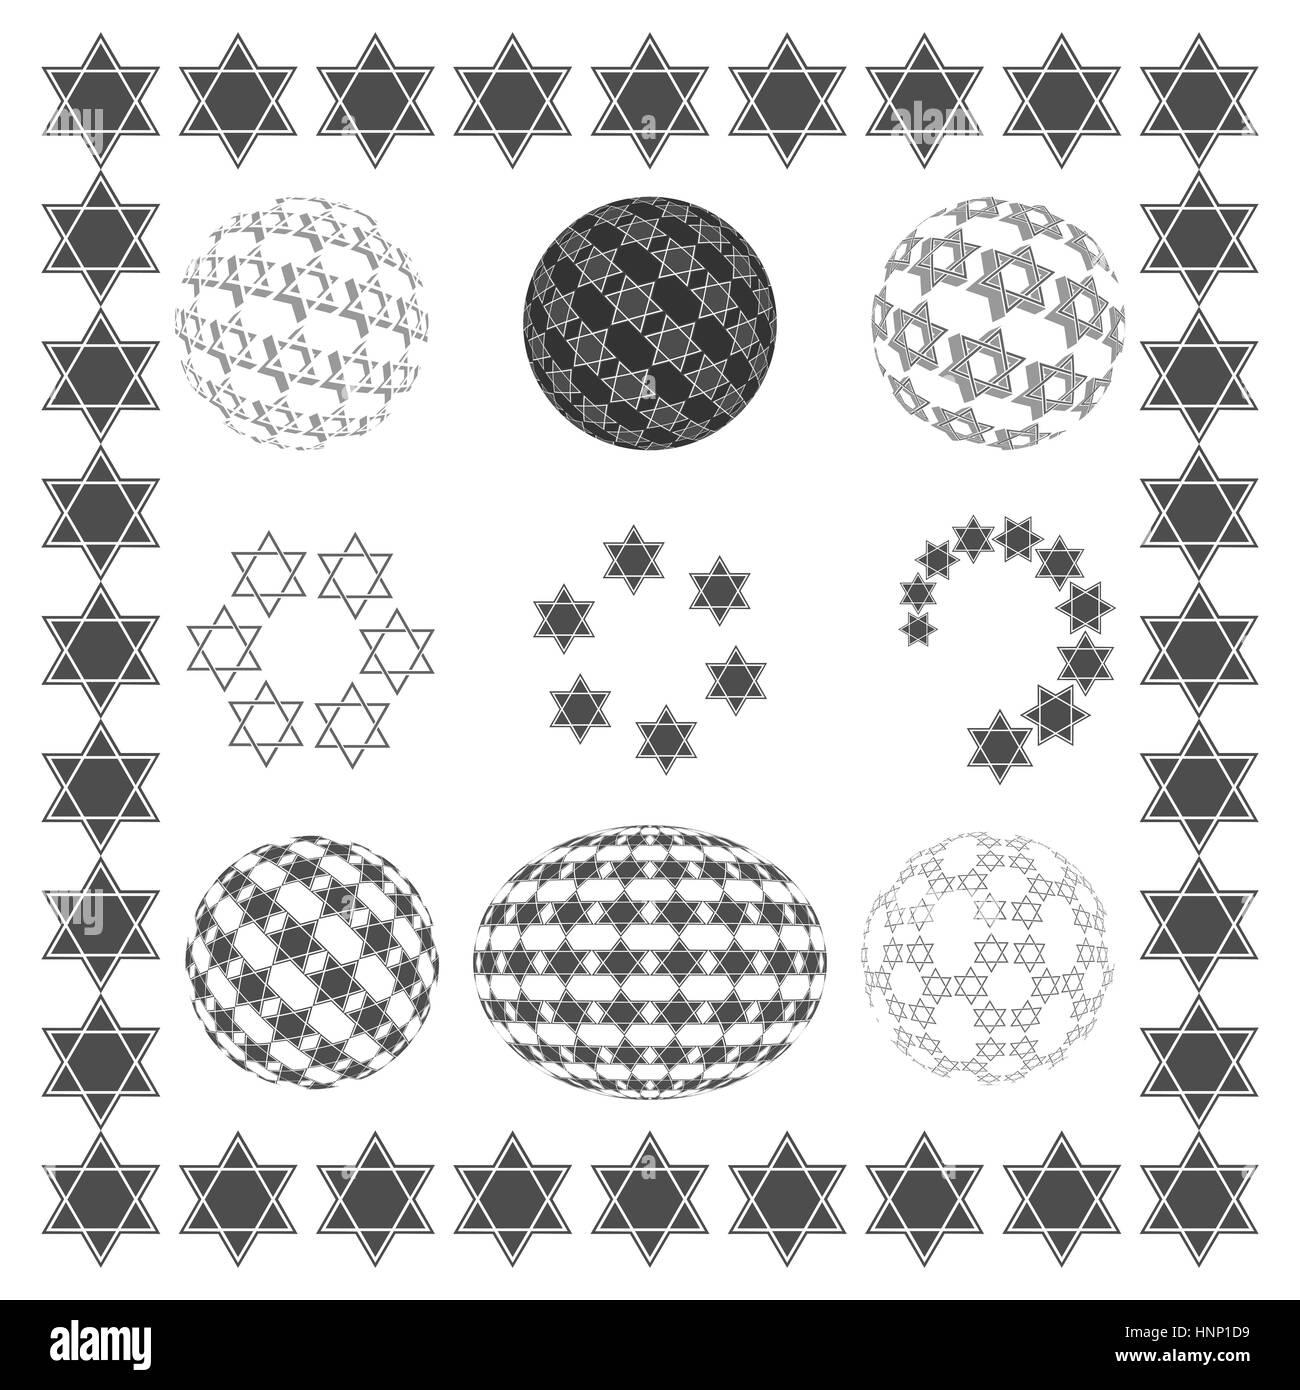 Set round sphere with black Star of David, Jewish religious symbols. - Stock Image